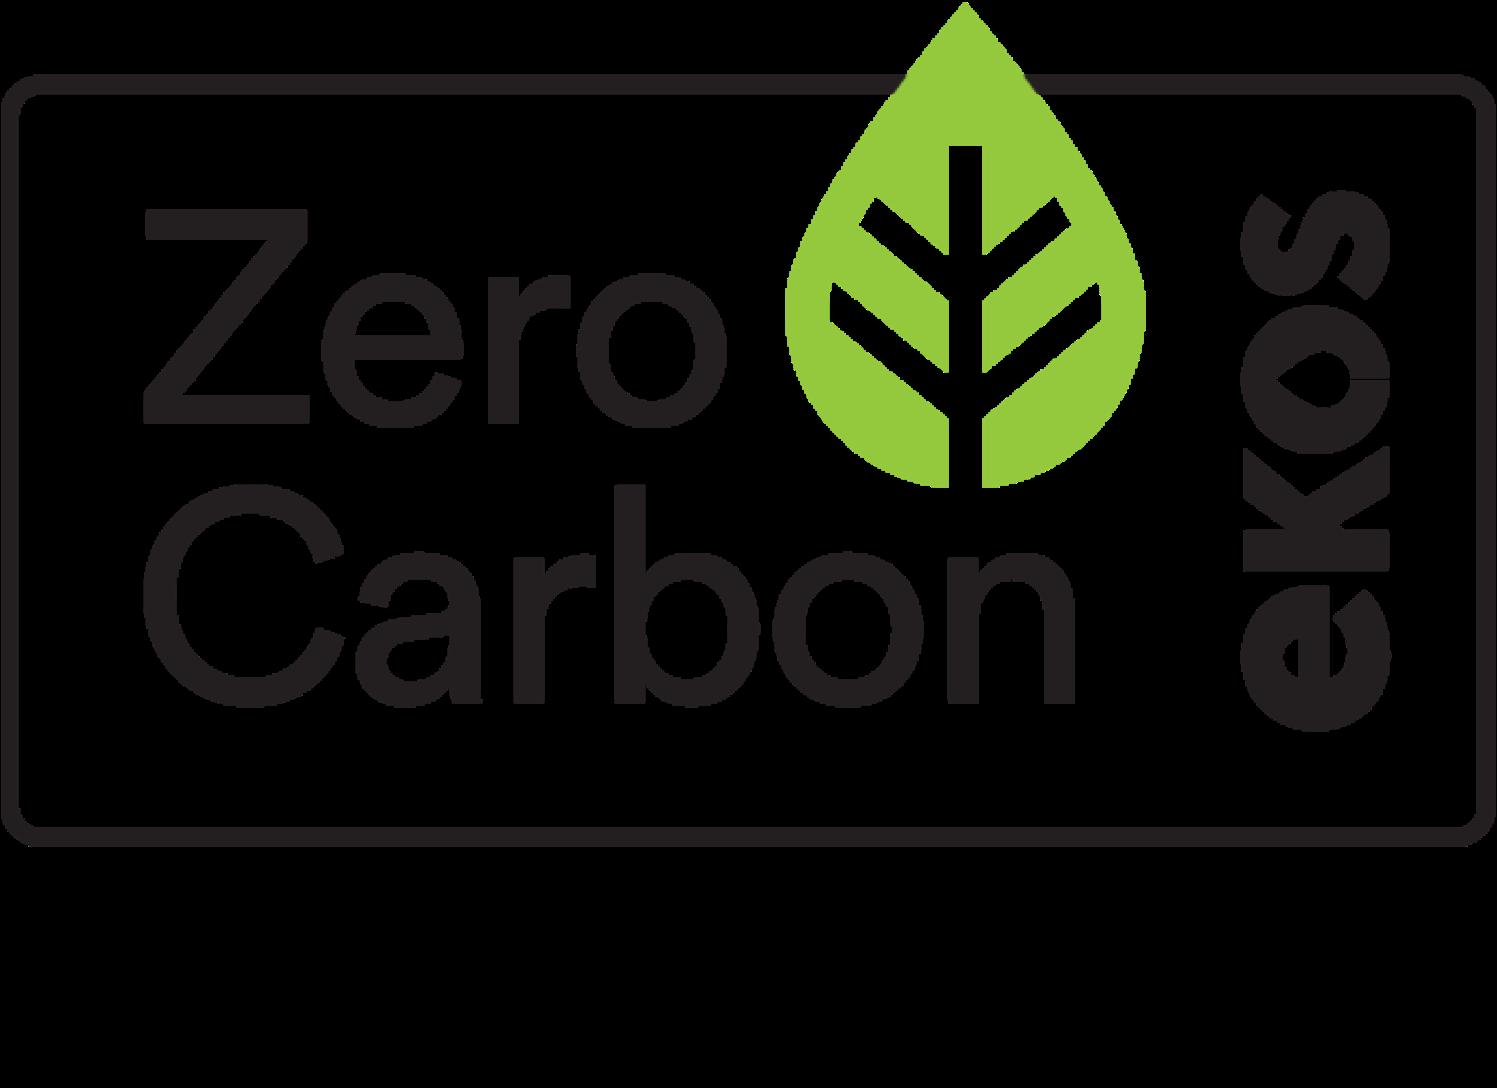 Zero Carbon Product.png